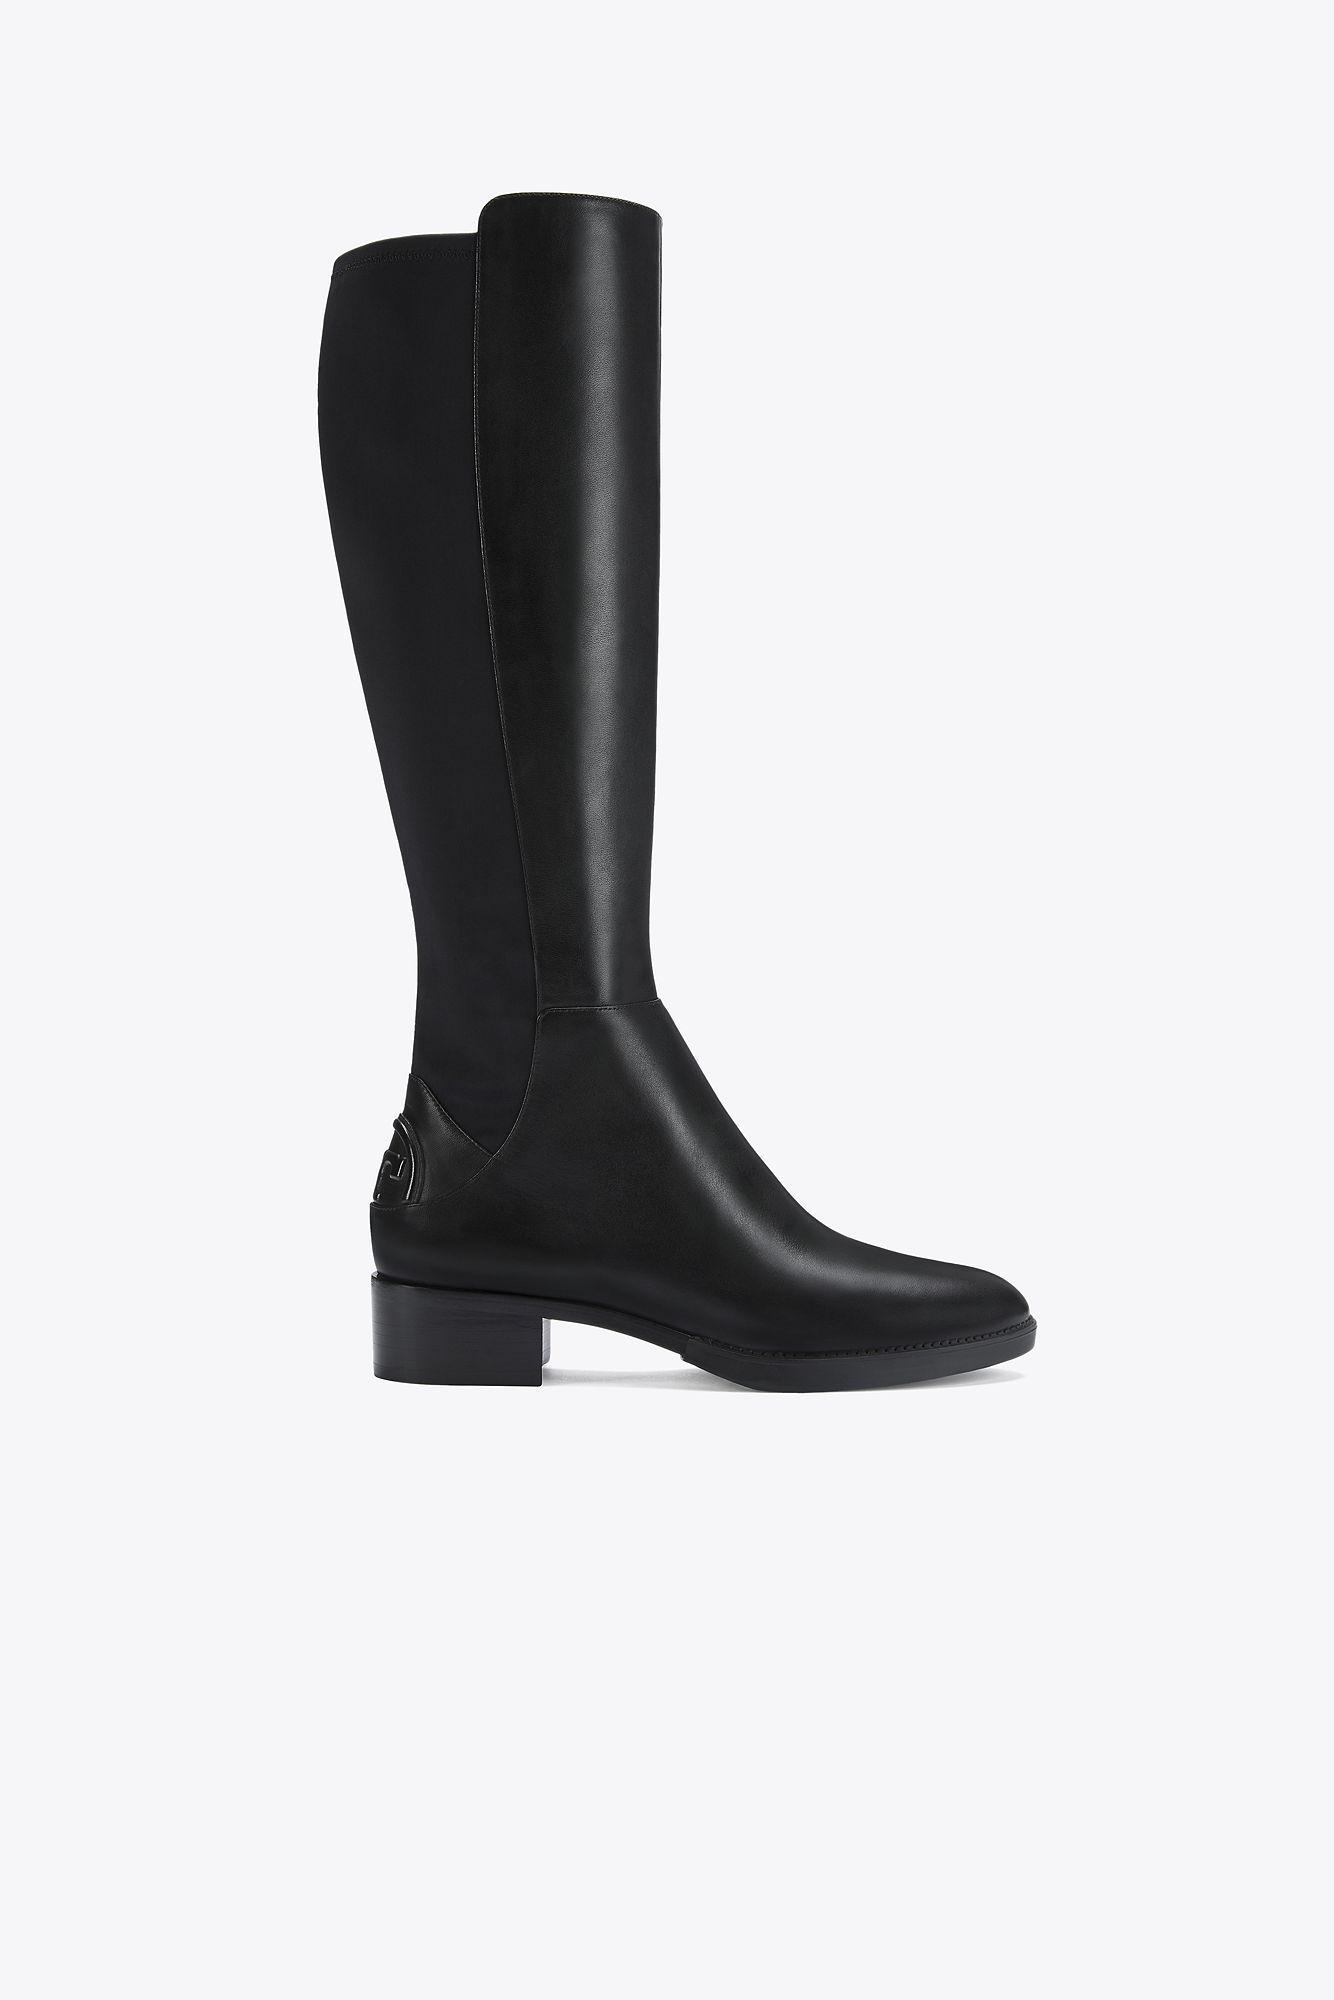 2d19e929085 Tory Burch Caitlin Stretch Boot in Black - Lyst